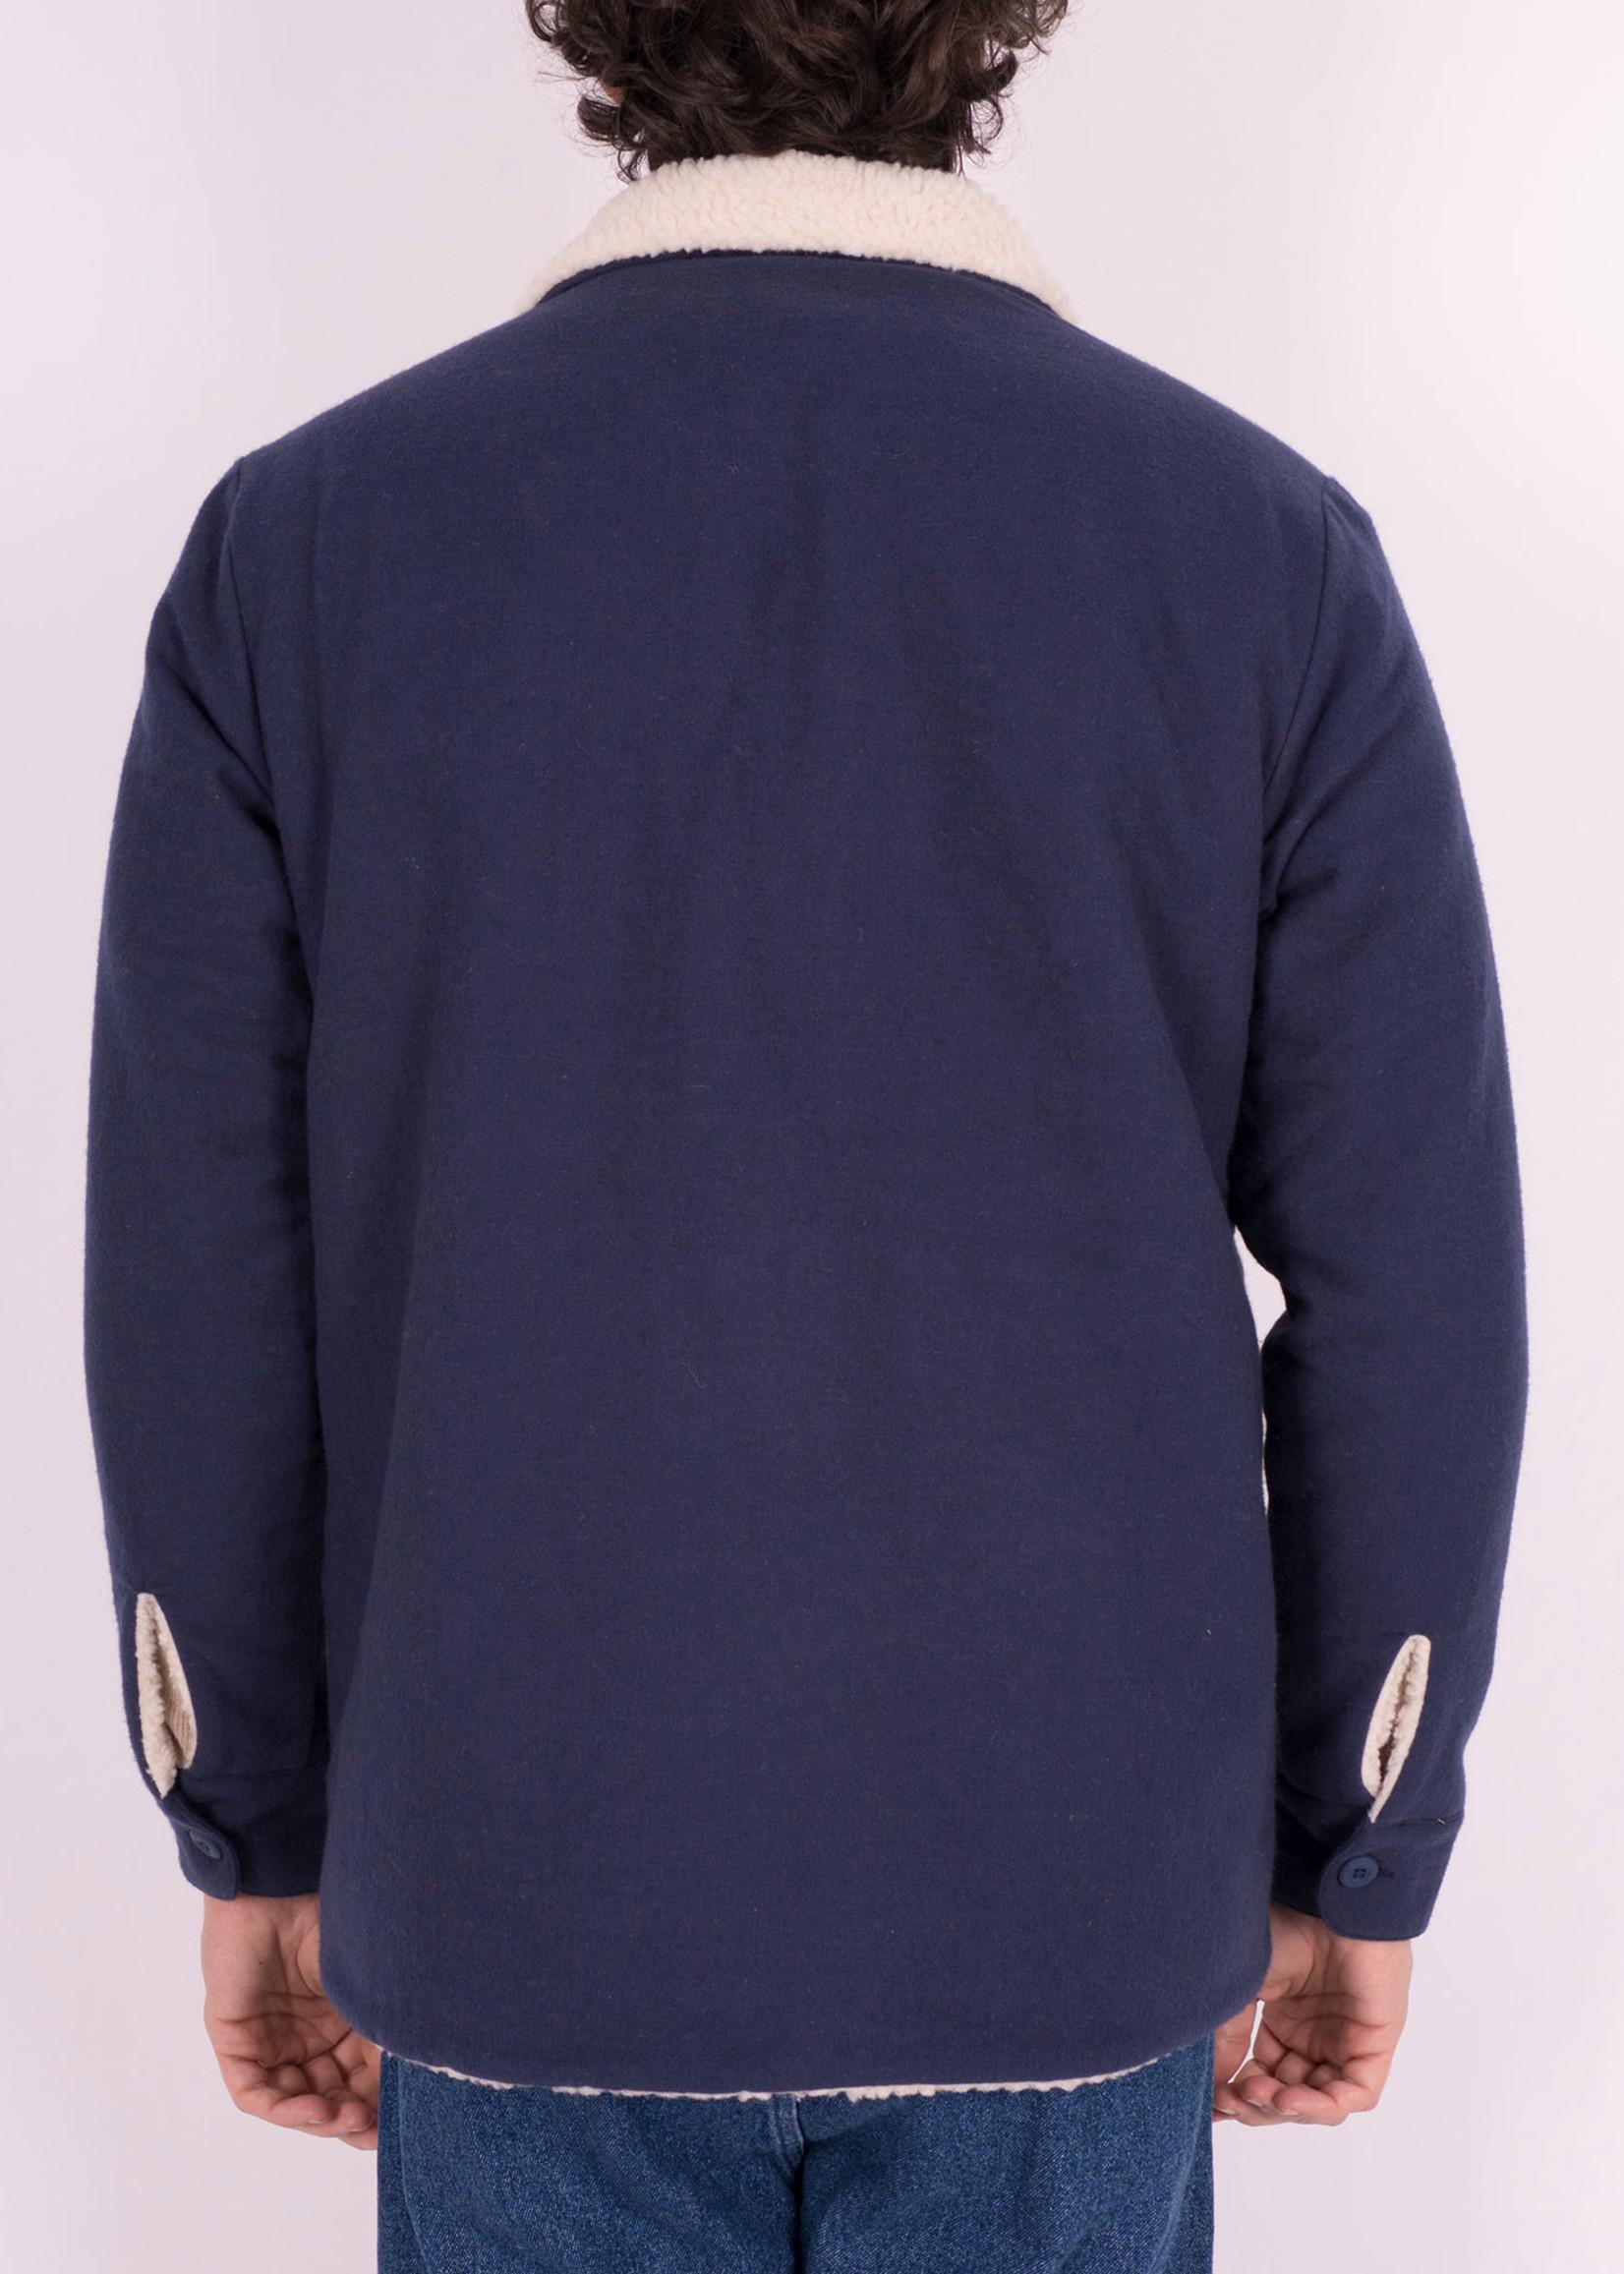 Portuguese Flannel Portuguese Flannel Sherpa Jacket Navy Reversible